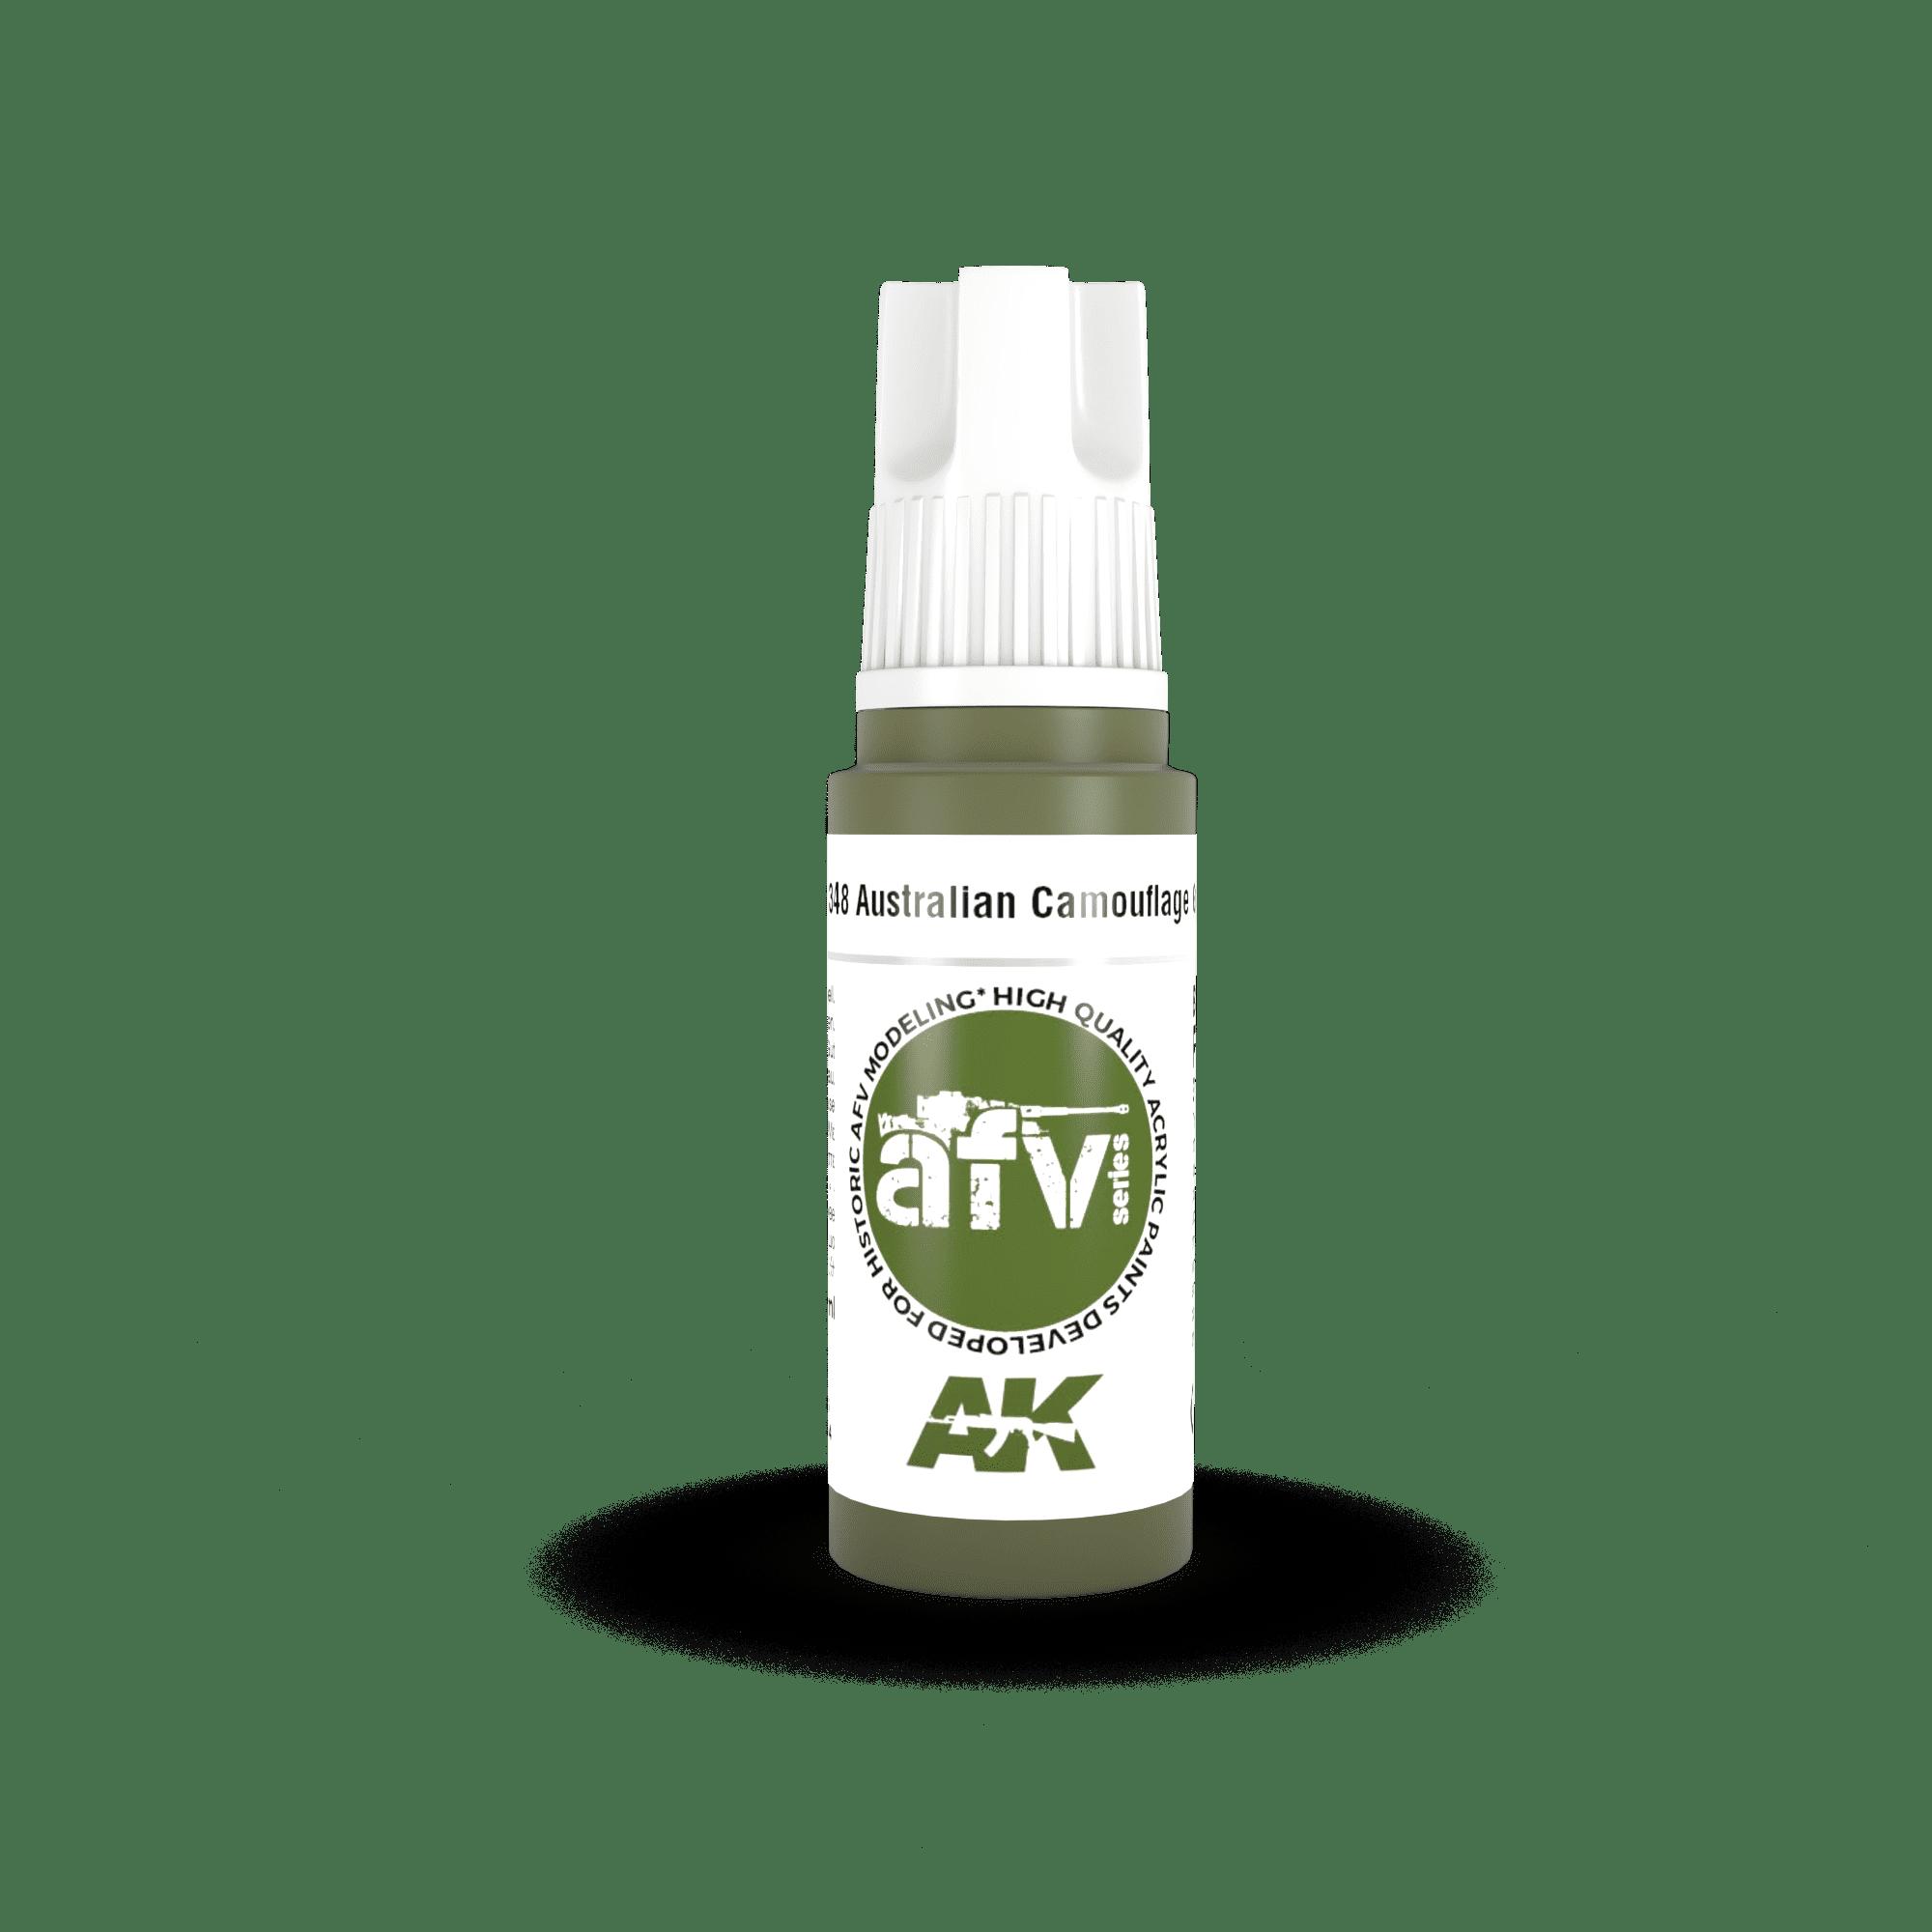 AK Interactive 3G Australian Camouflage Green